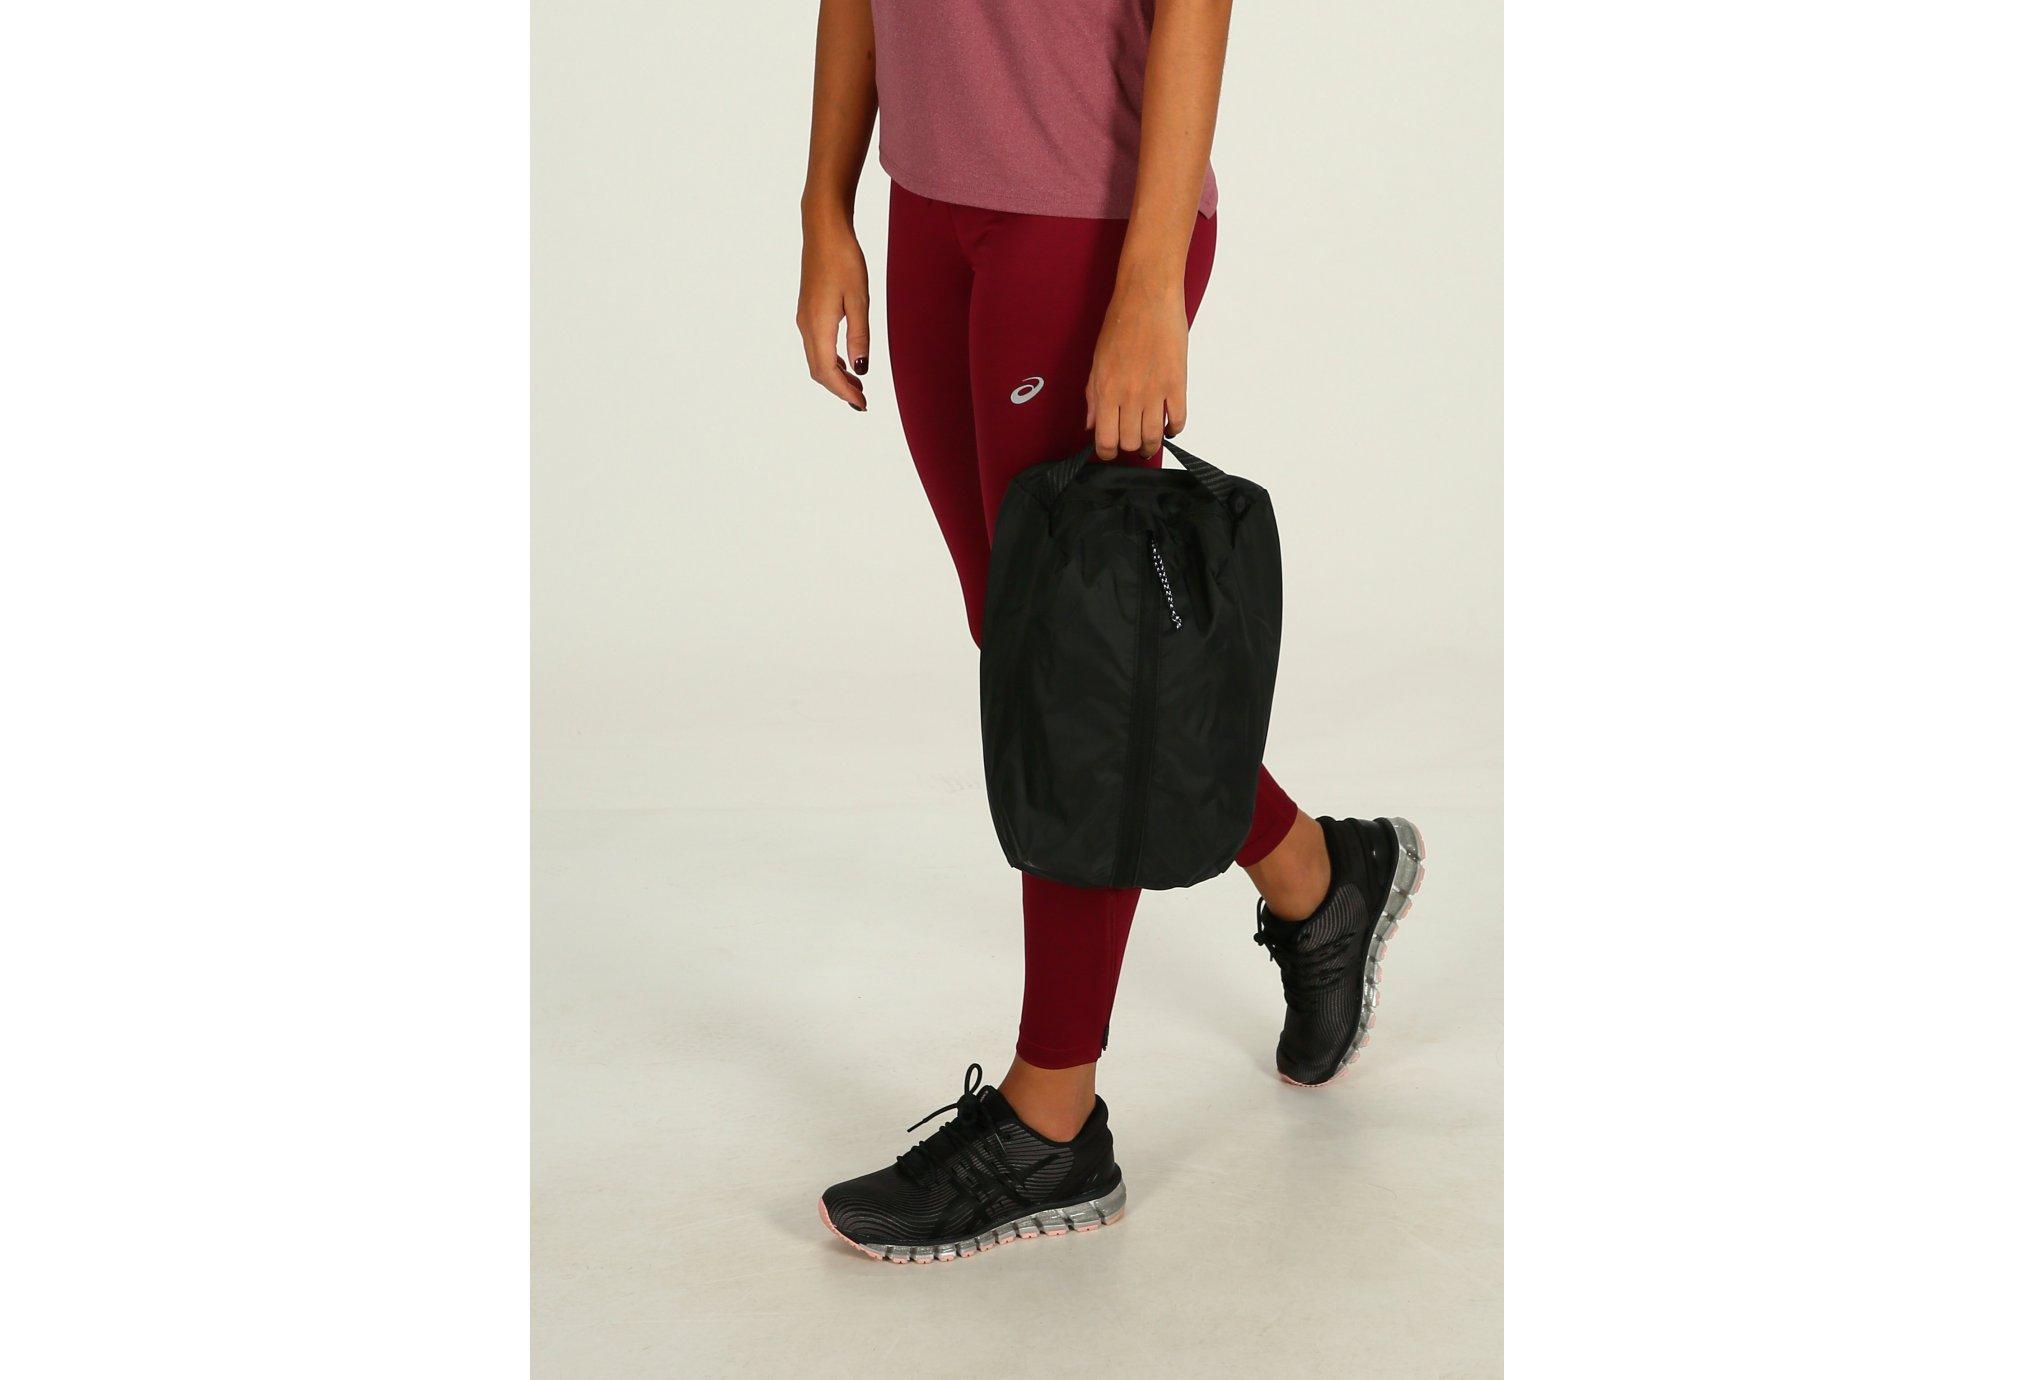 Asics Shoecase Sac de sport